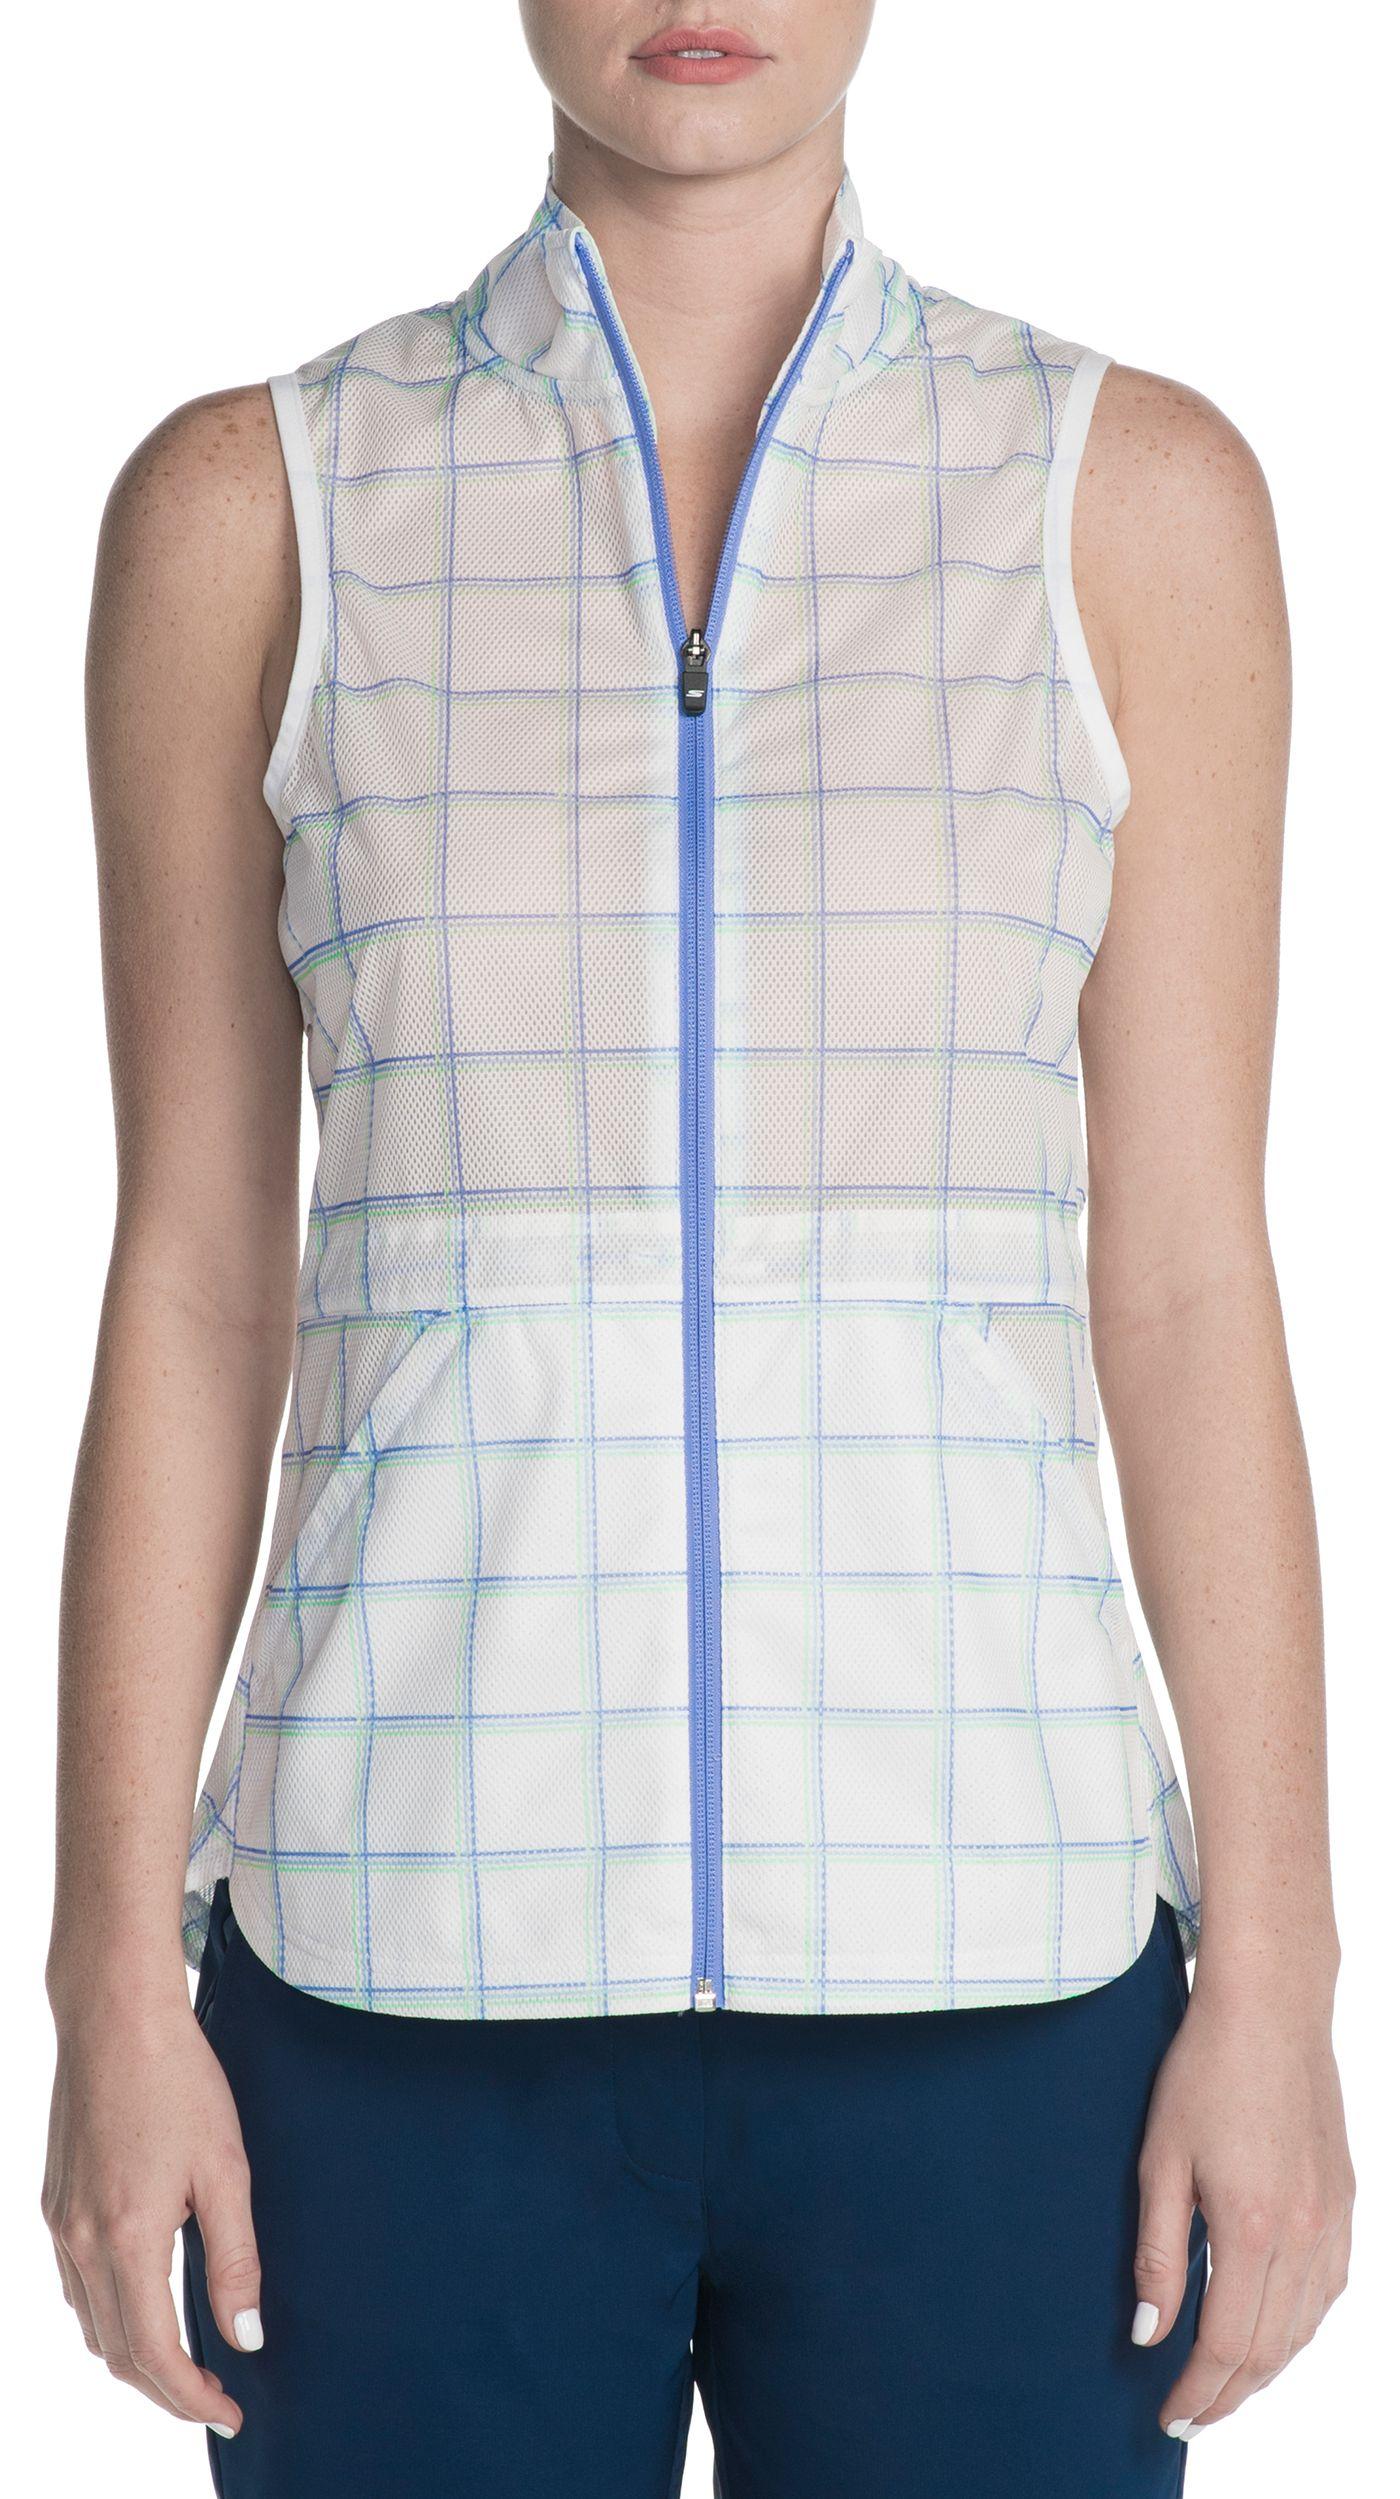 Skechers Women's Go Golf GO Shield Jubilee Golf Vest